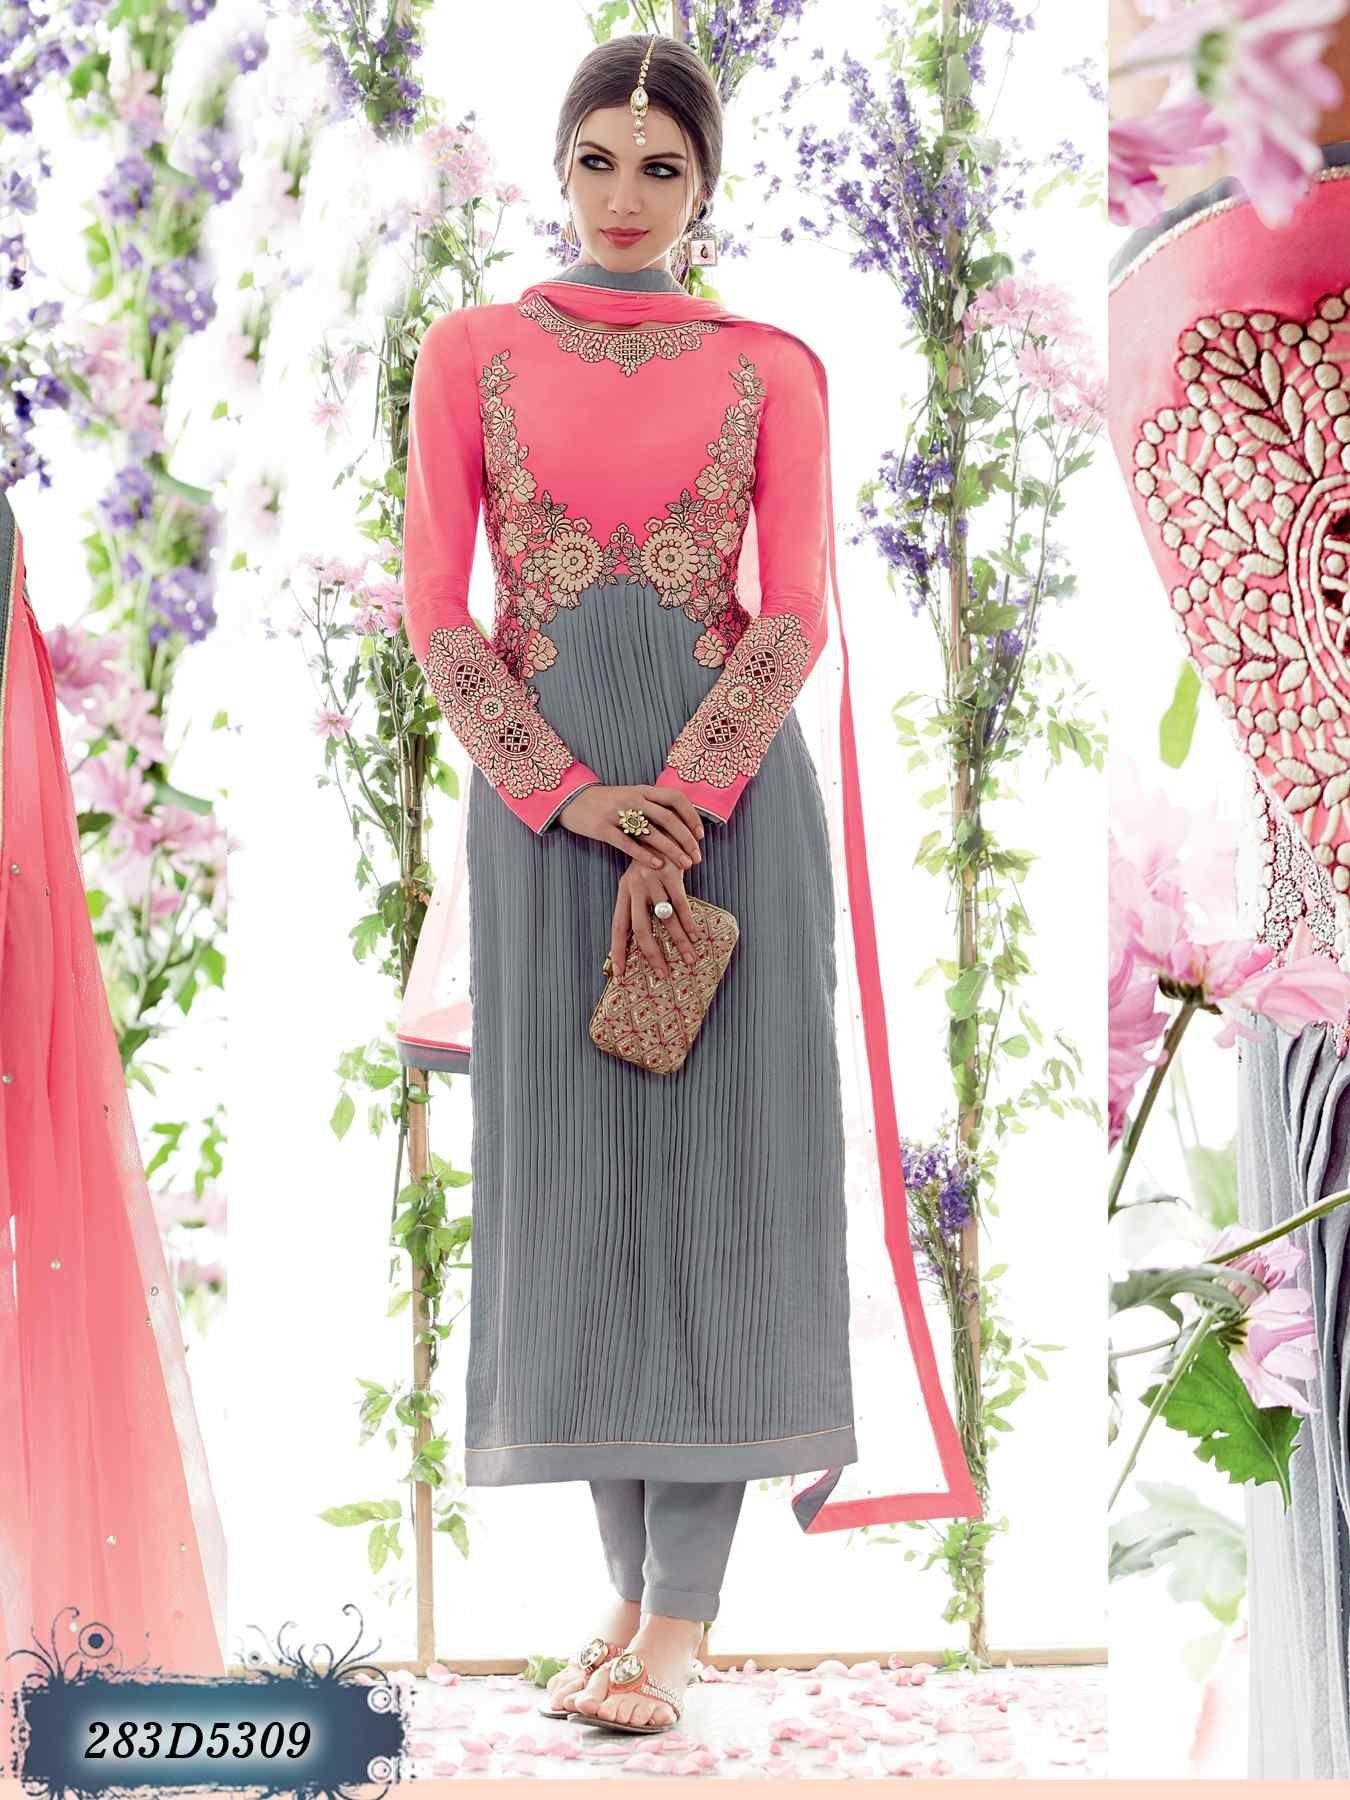 Designer Salwar Kameez Anarkali Suit Ethnic Bollywood Pakistanais Dupatta Parti KL